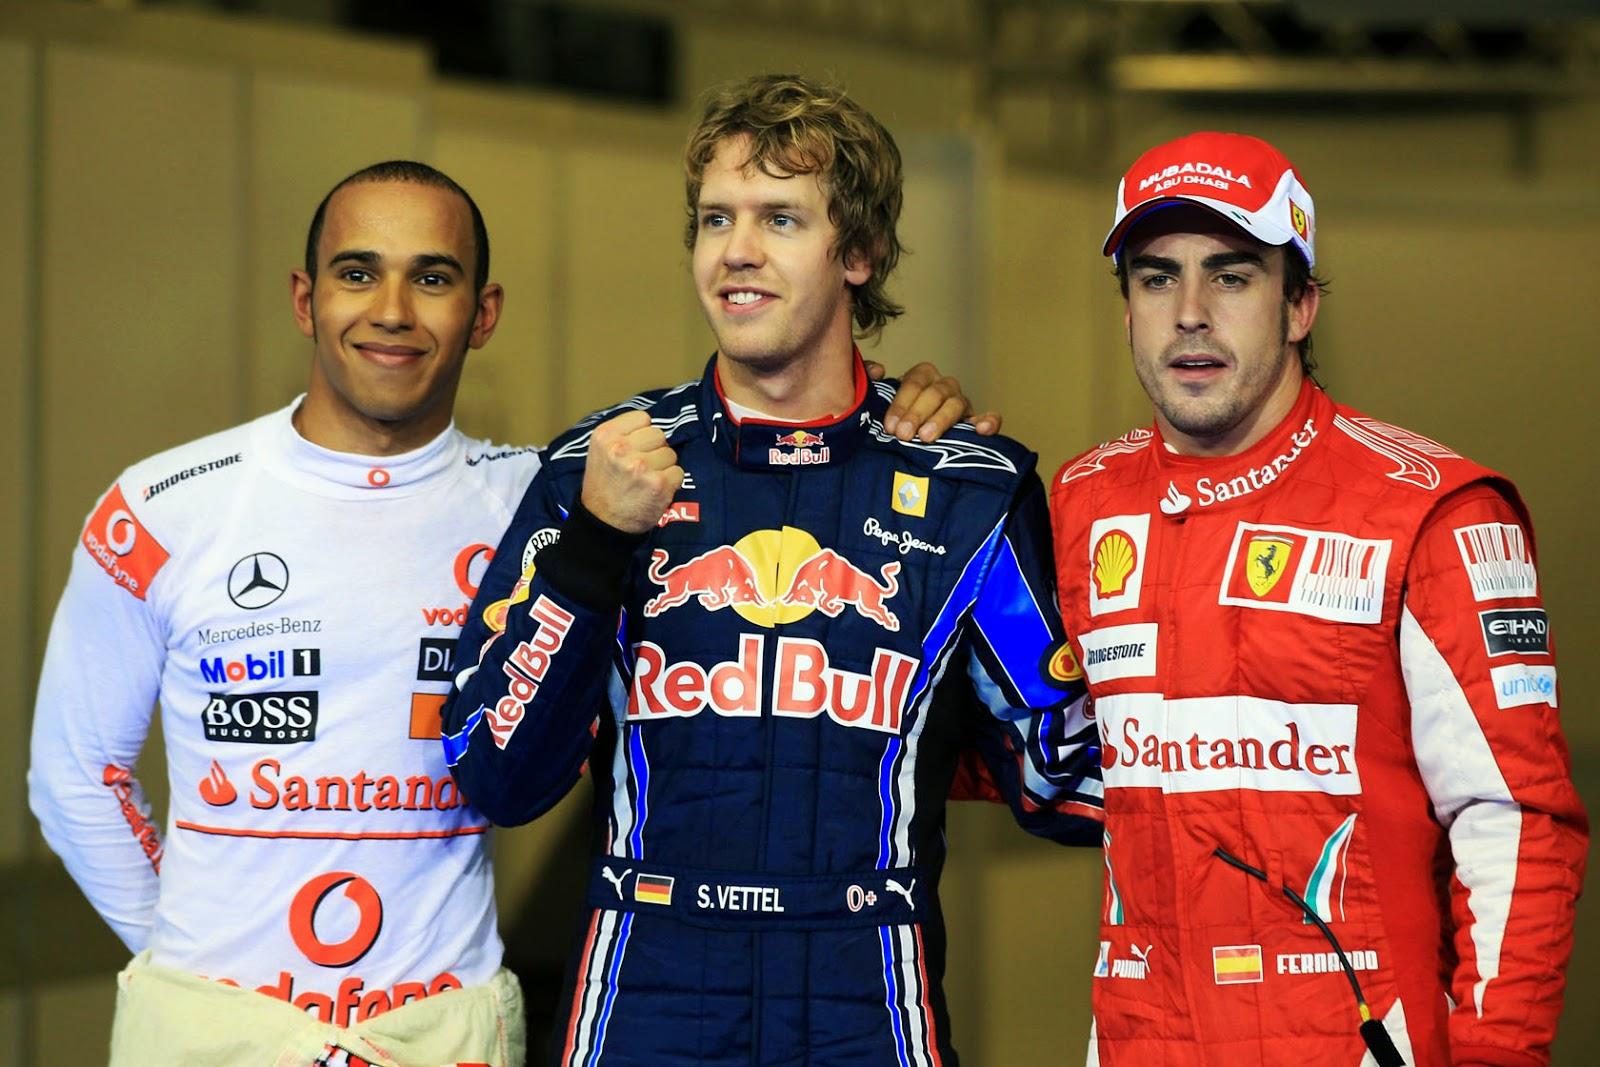 Vettel, Hamilton yFernando Alonso